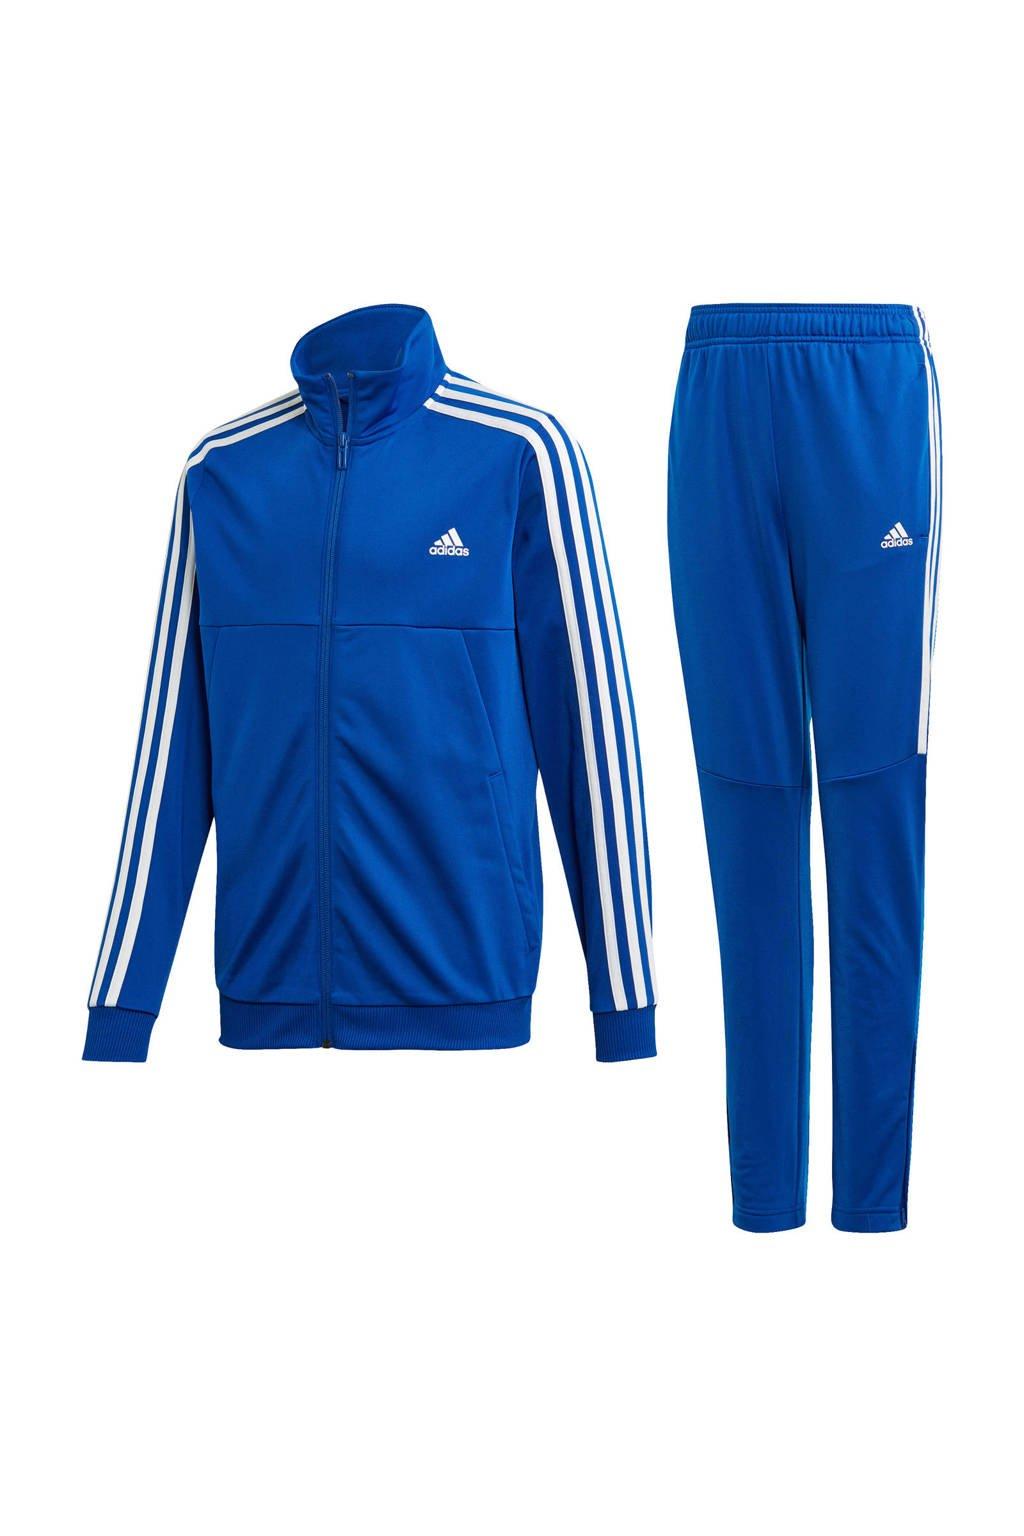 adidas   trainingspak blauw, Blauw/wit